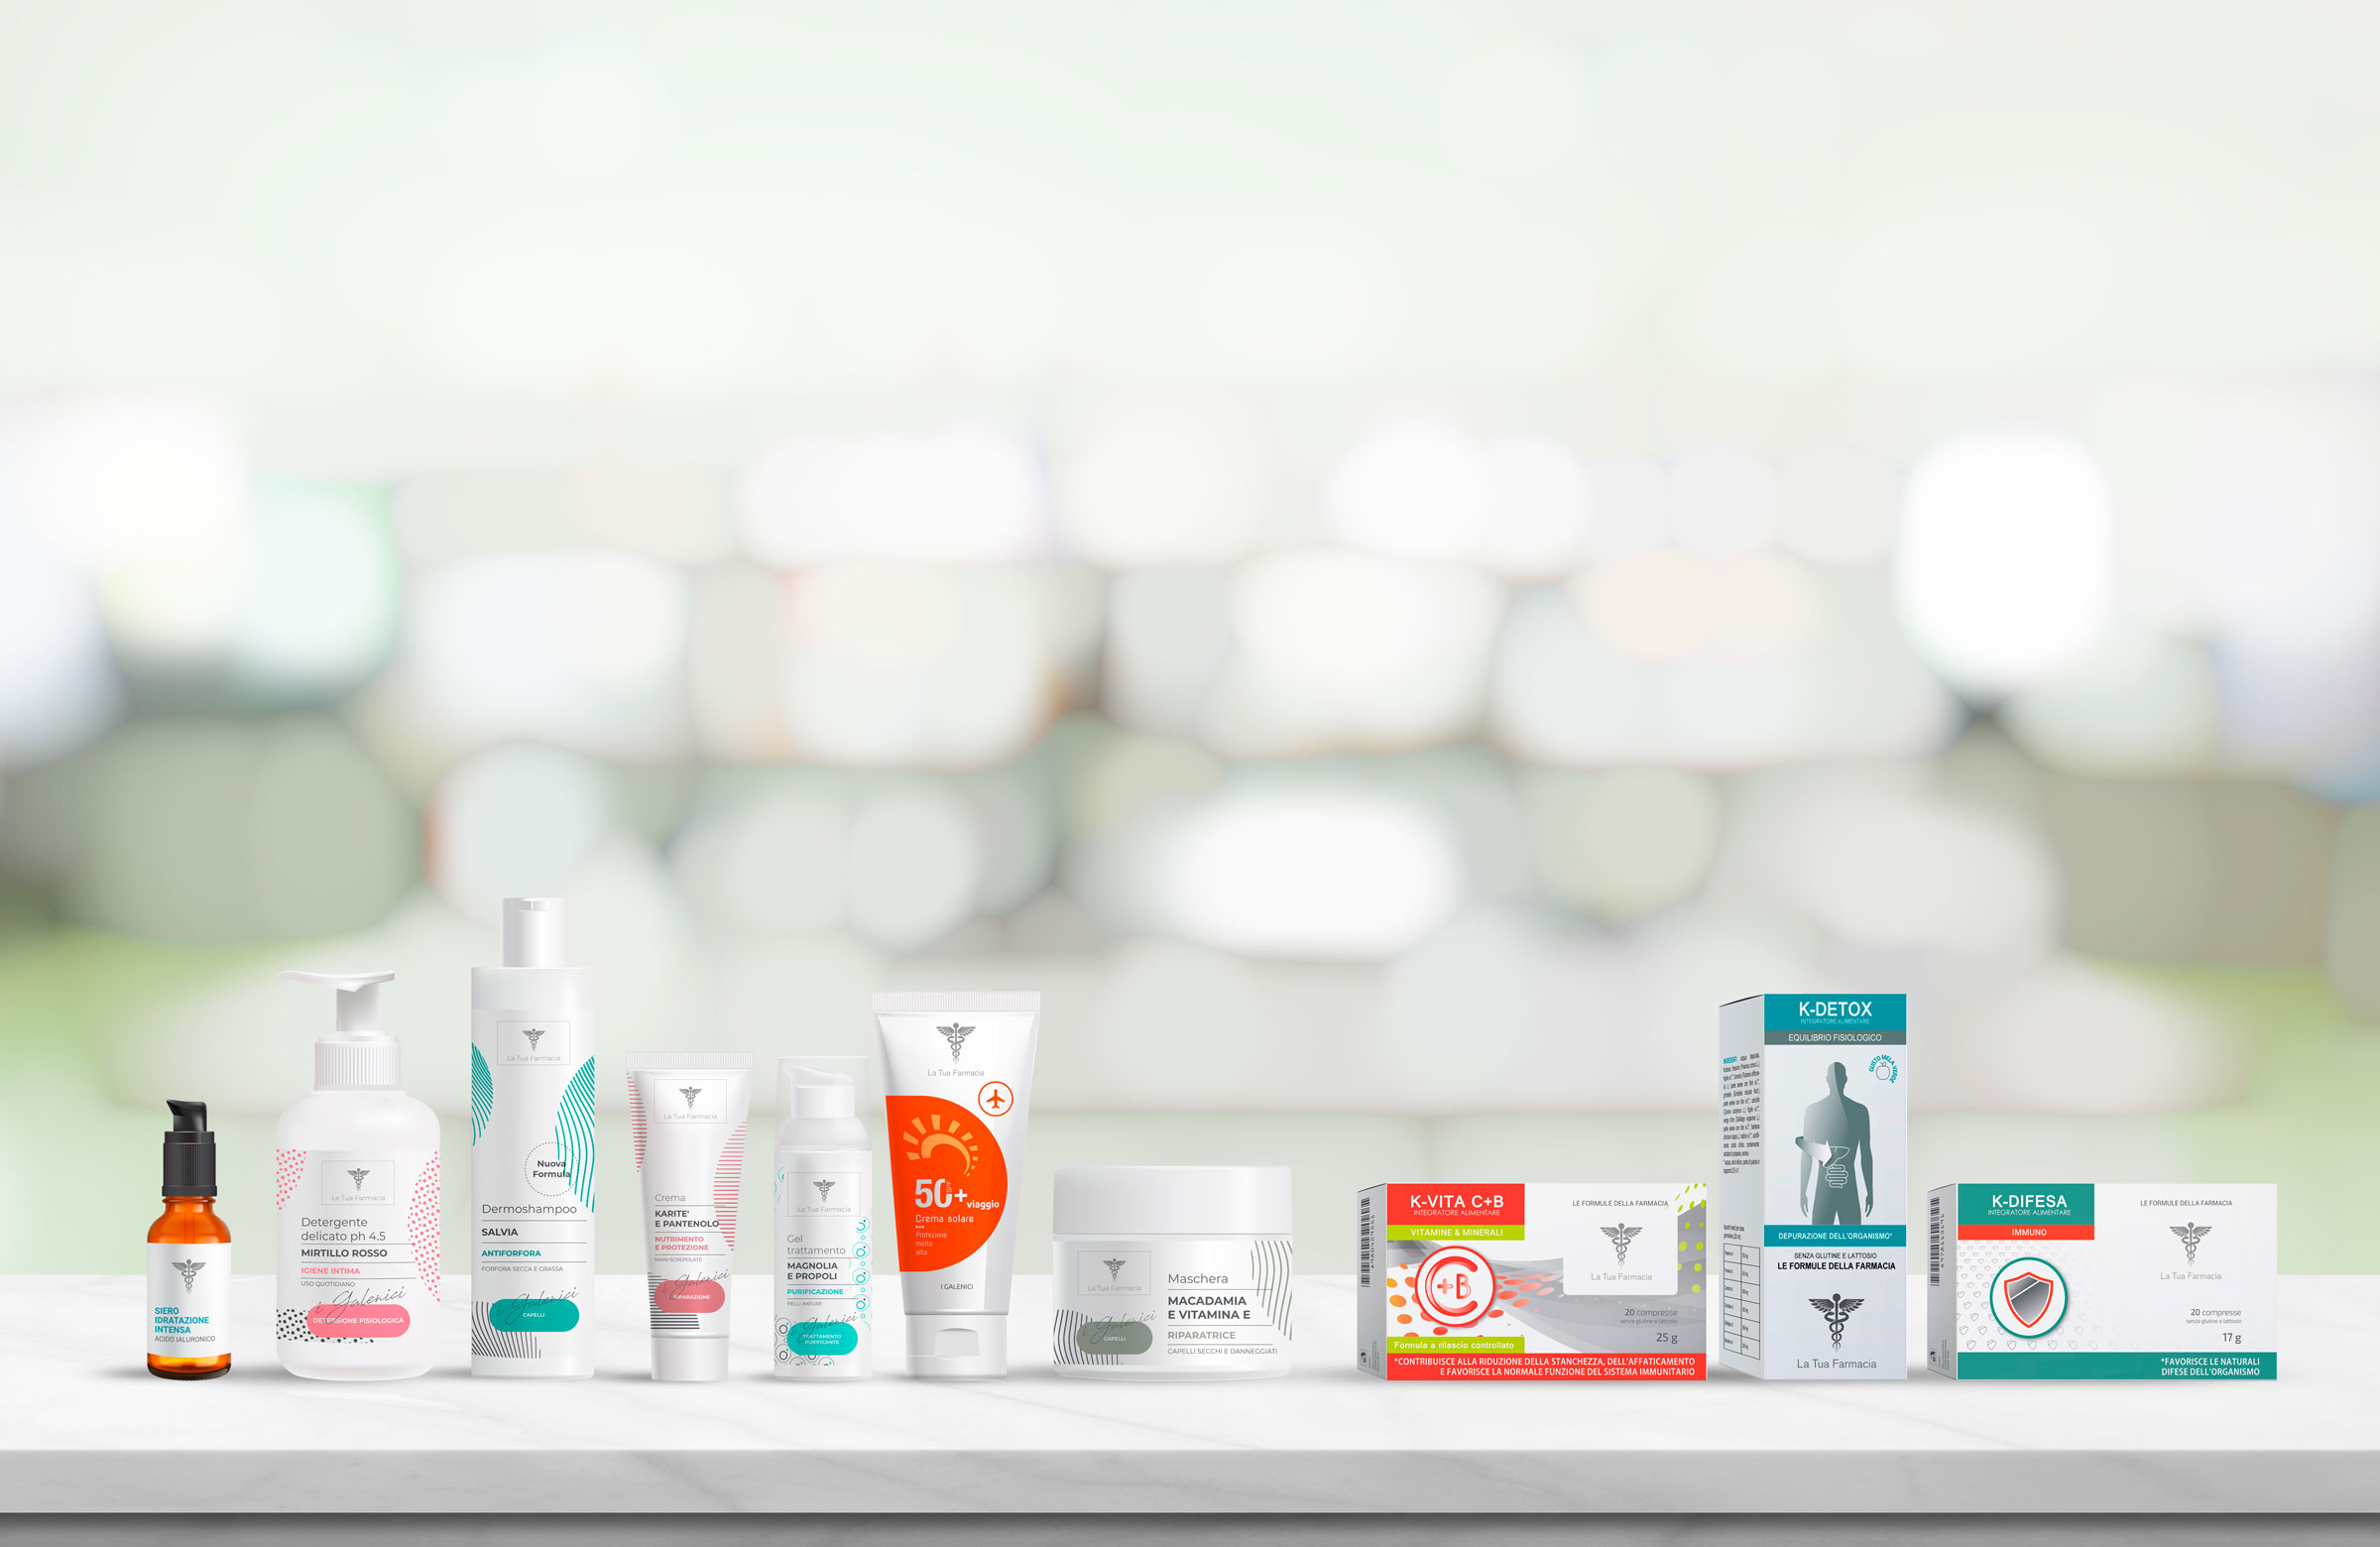 Integratori-e-cosmetici-Kalis-v1